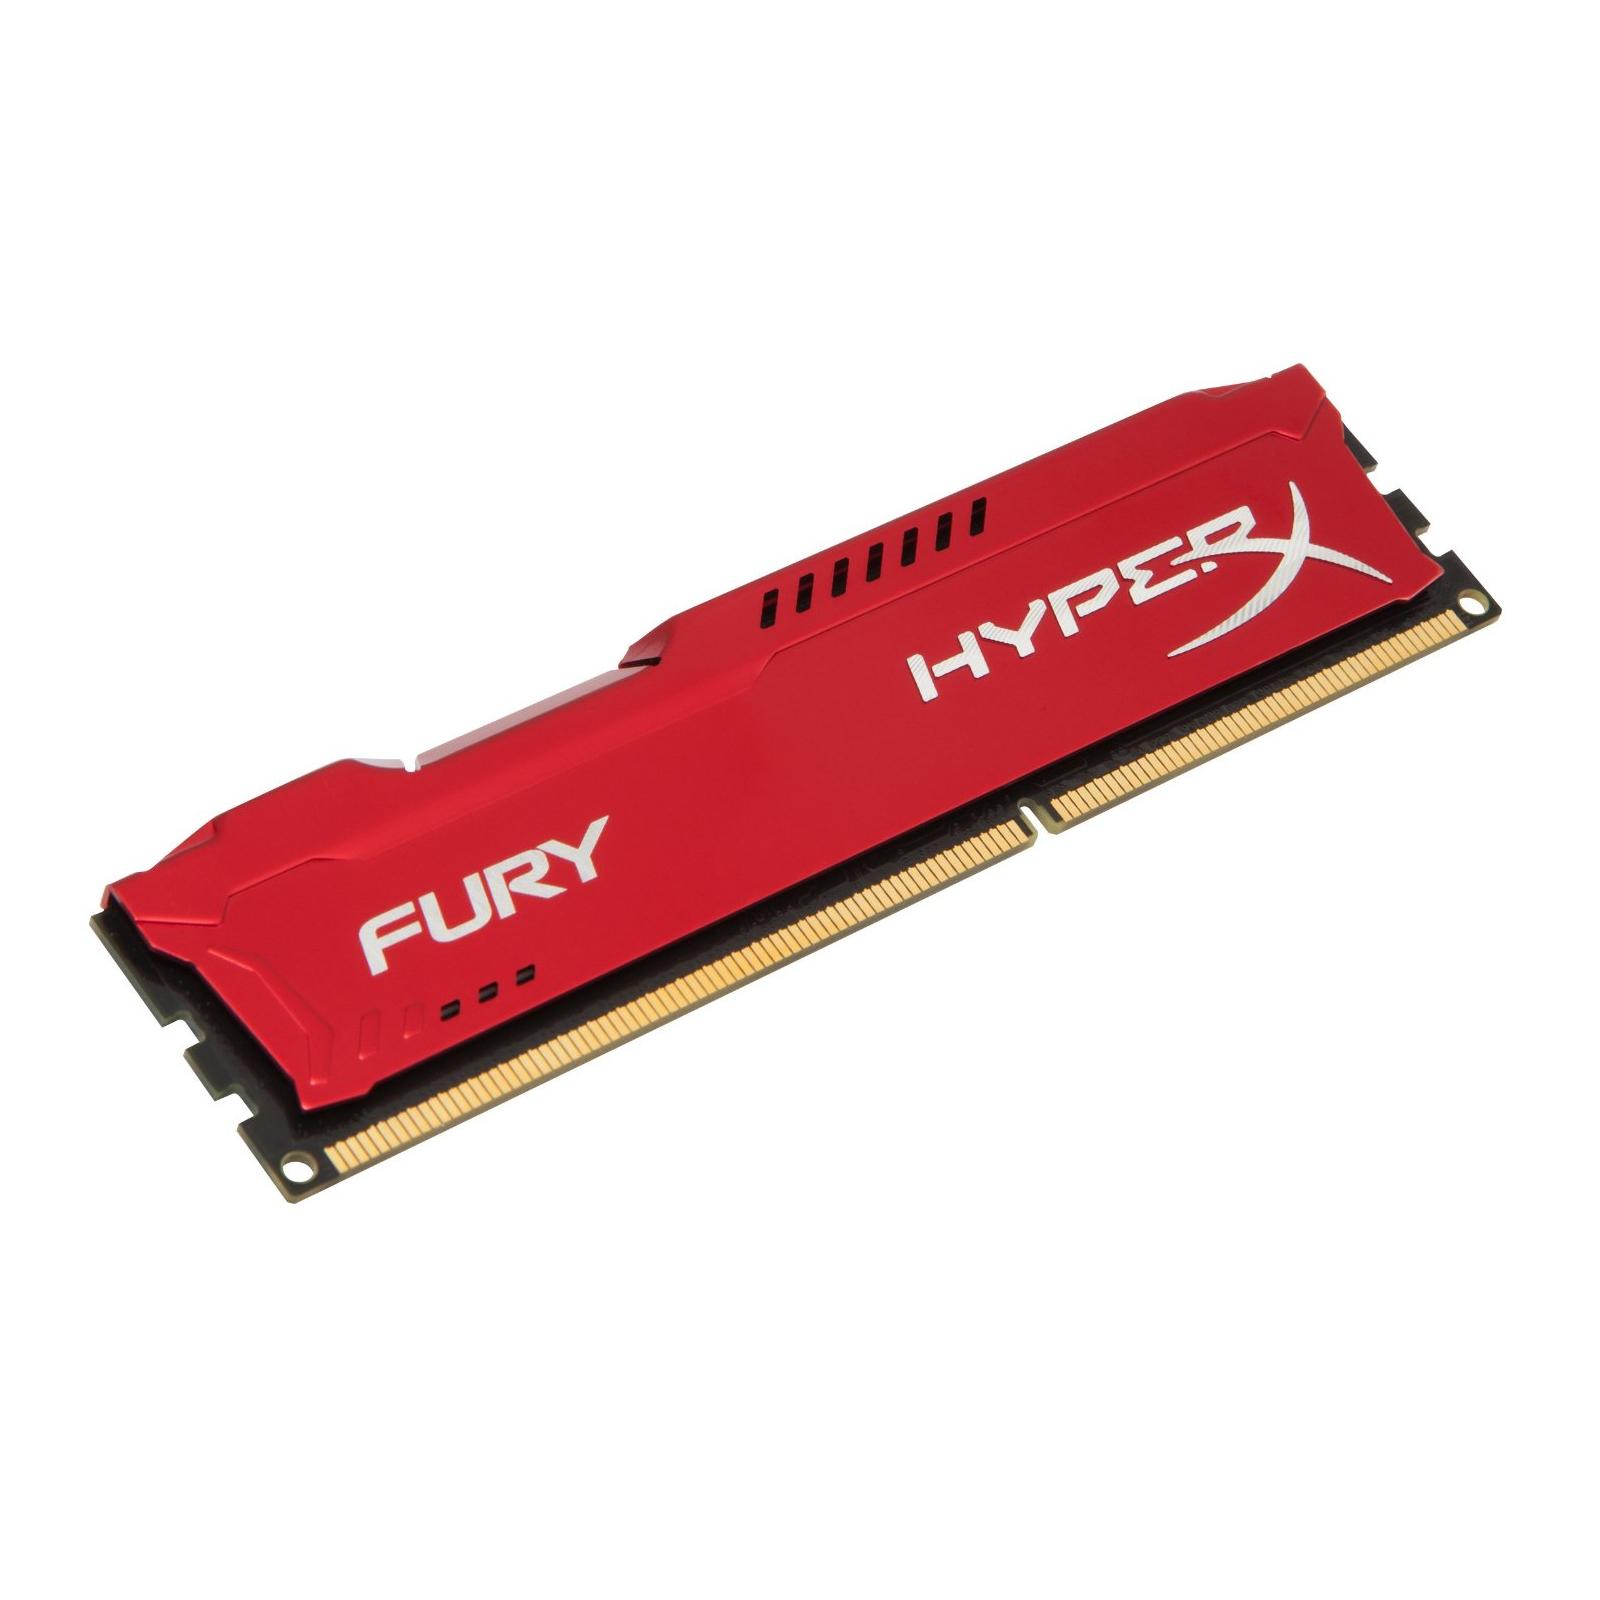 Модуль памяти для компьютера DDR3 4Gb 1866 MHz HyperX Fury Red Kingston (HX318C10FR/4) изображение 2